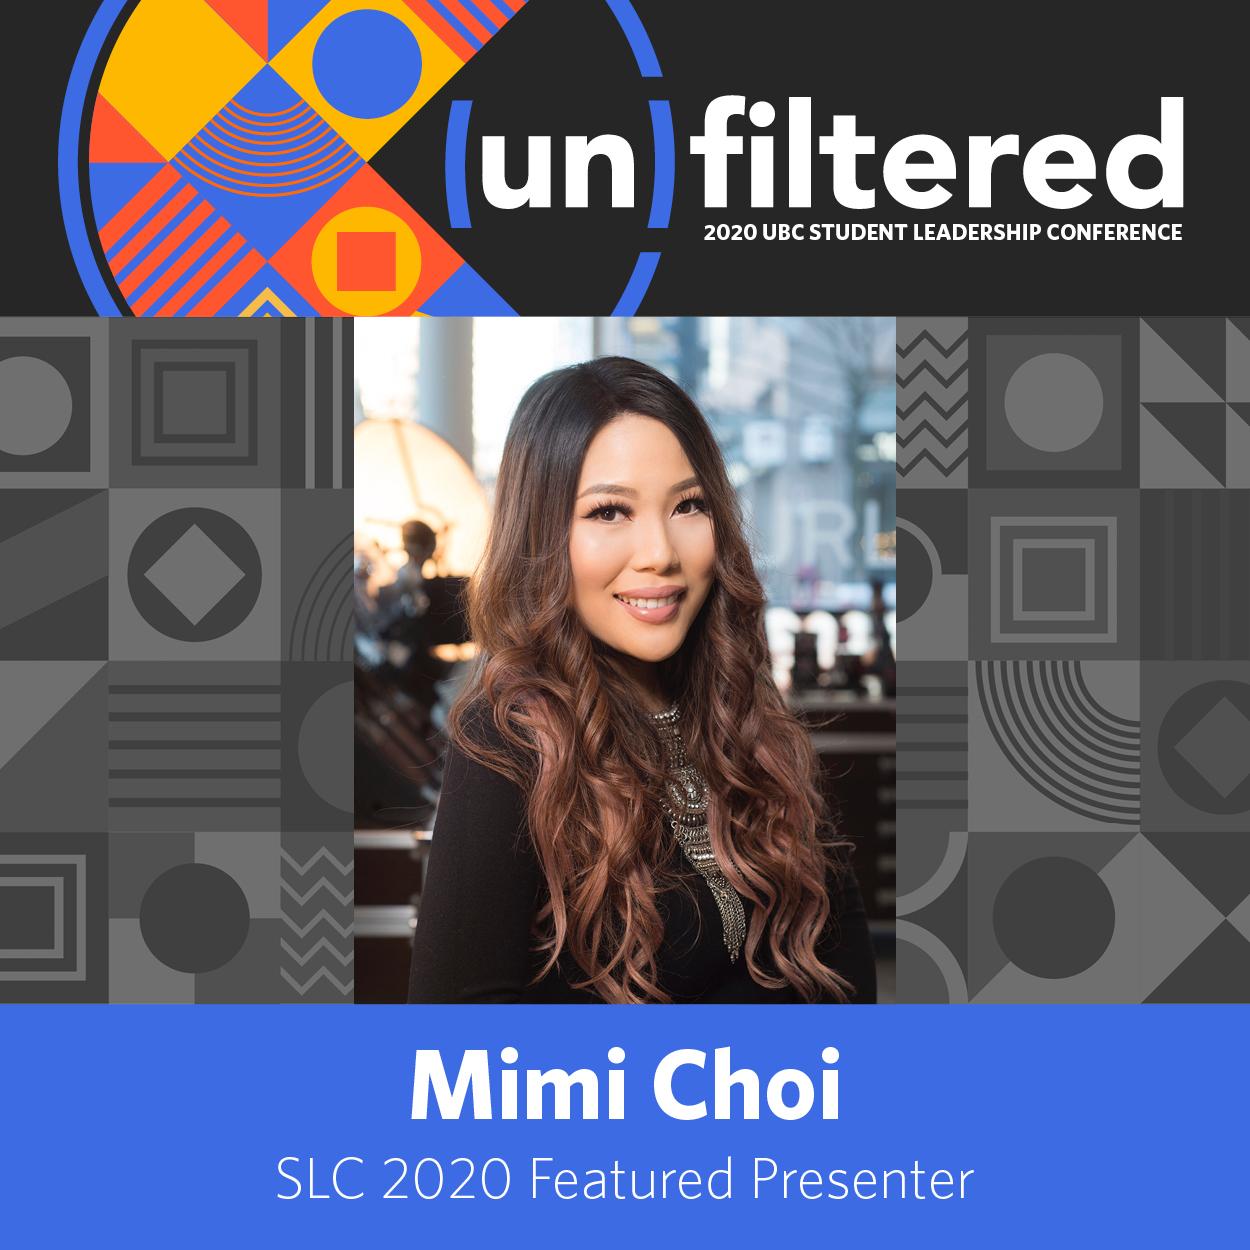 SLC 2020 Featured Presenter Mimi Choi